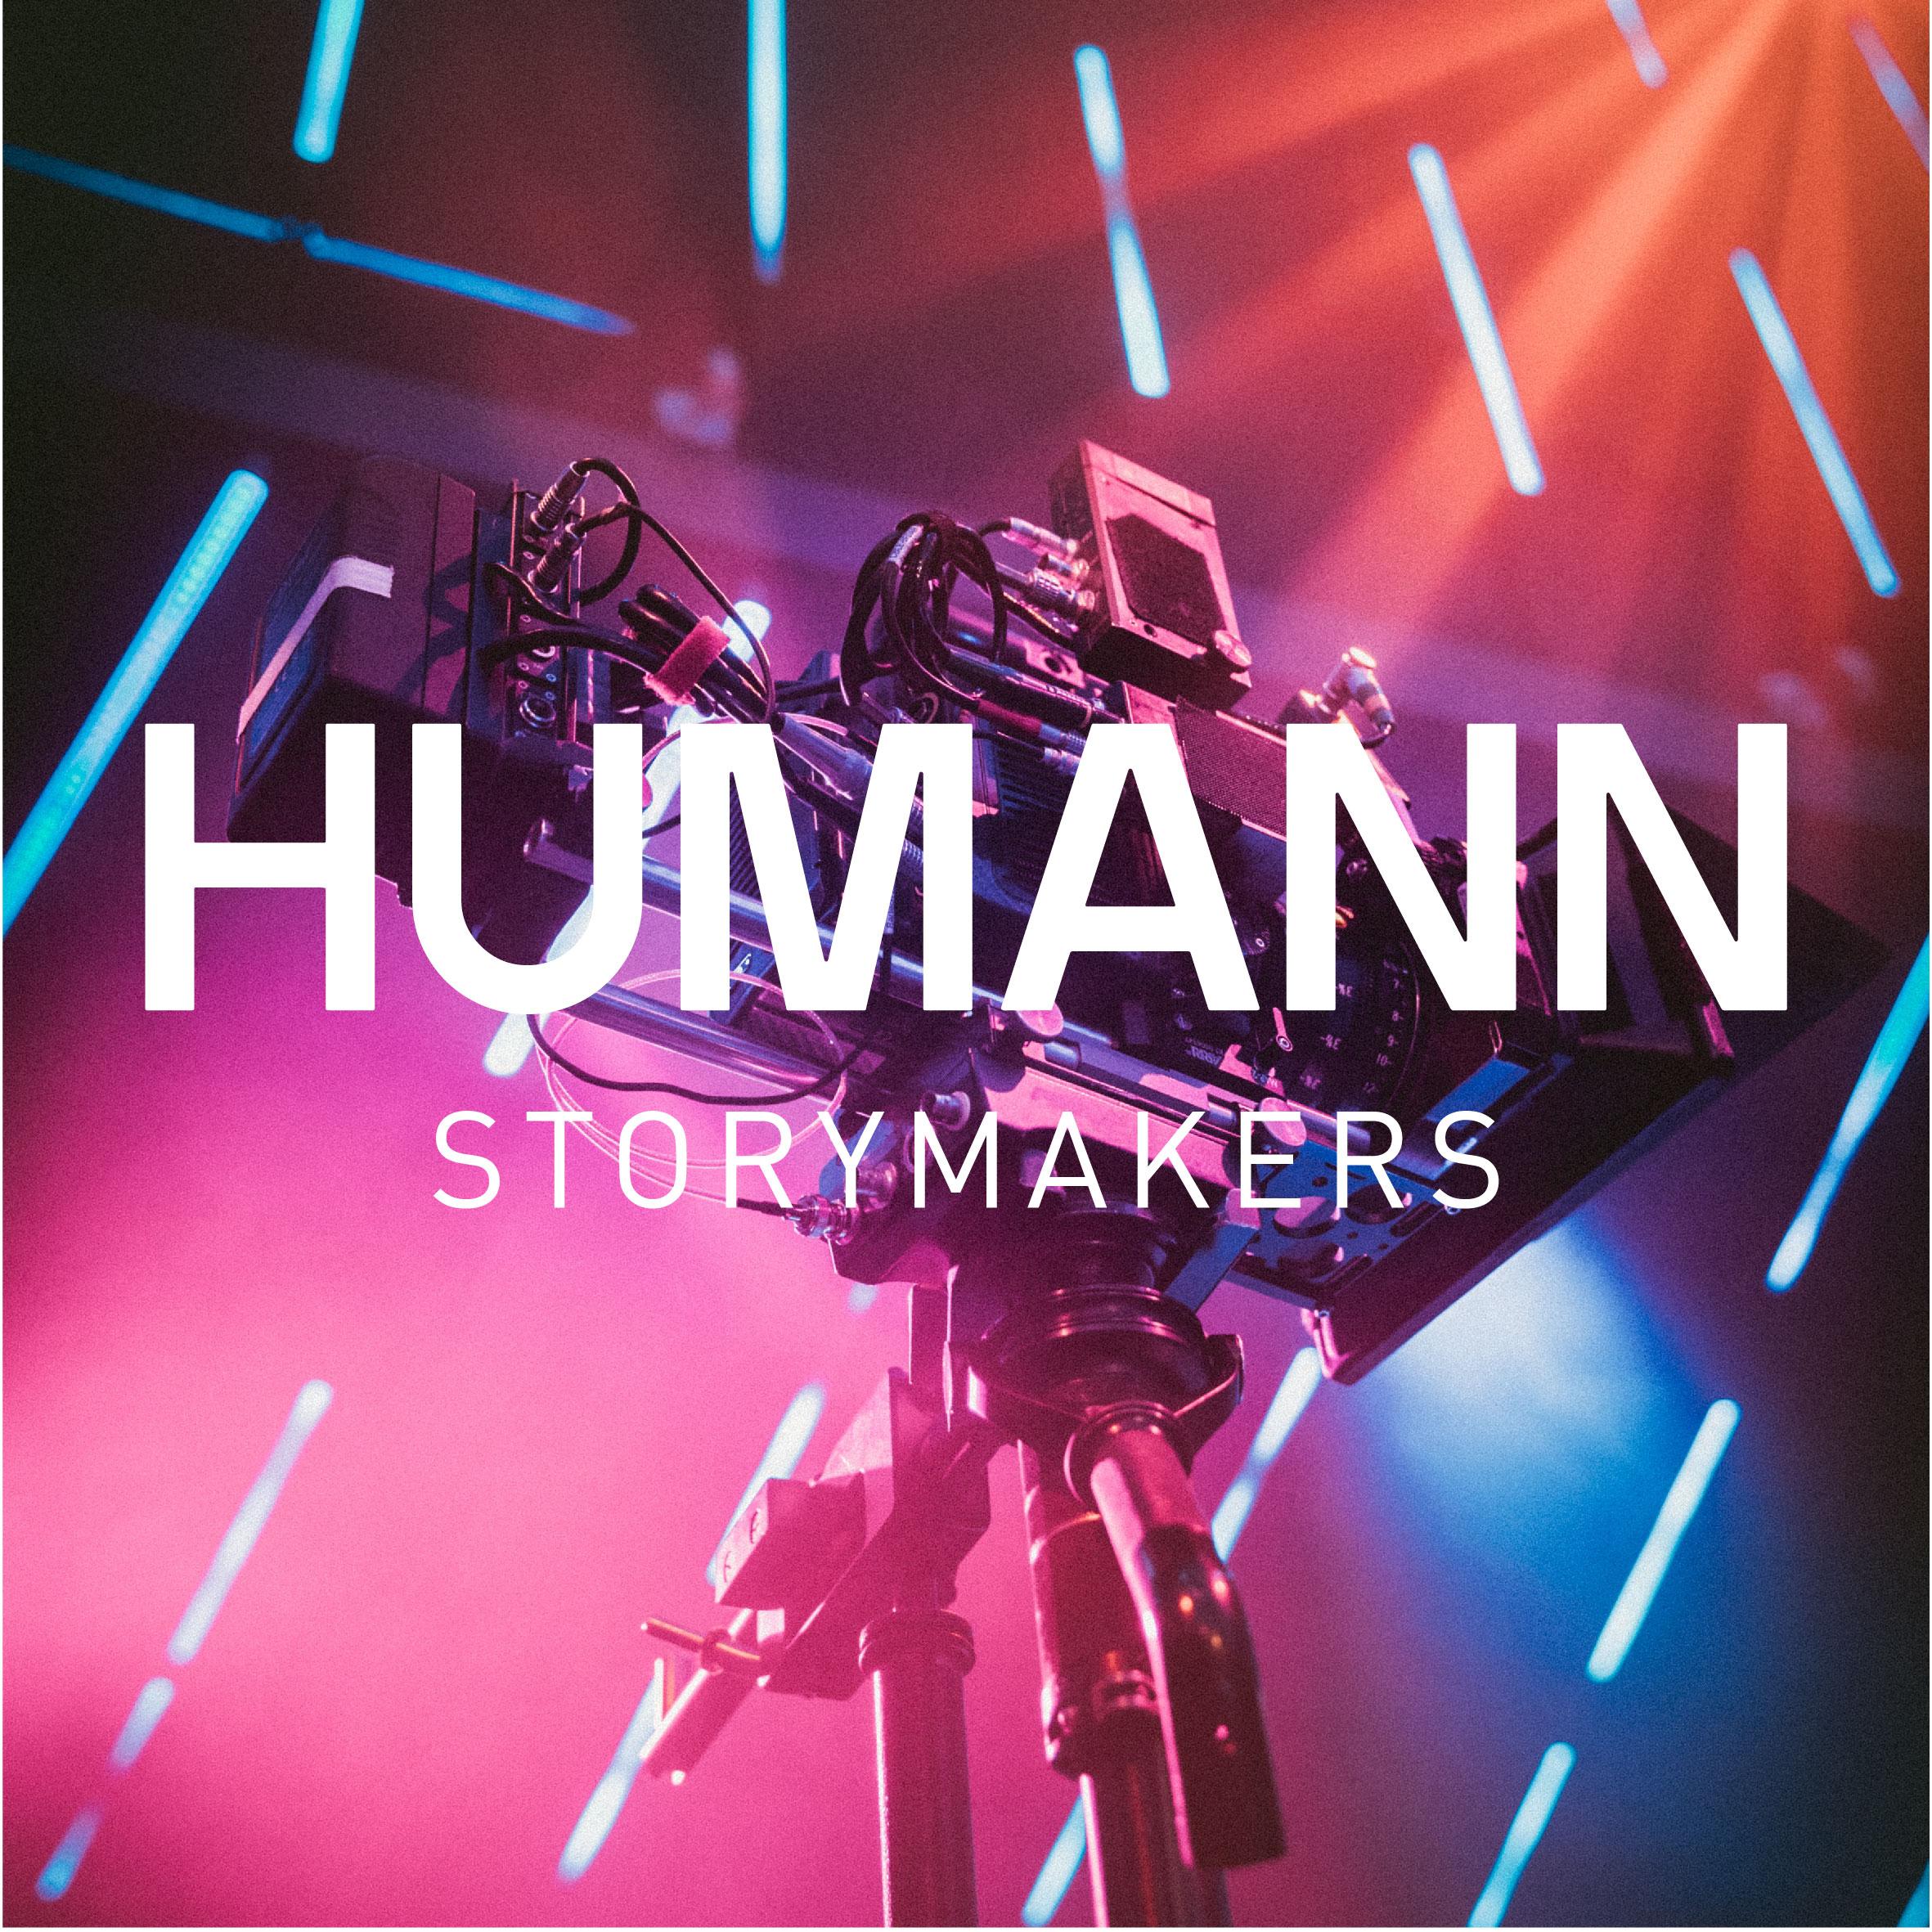 Human_Redes_Sociales_02.jpg